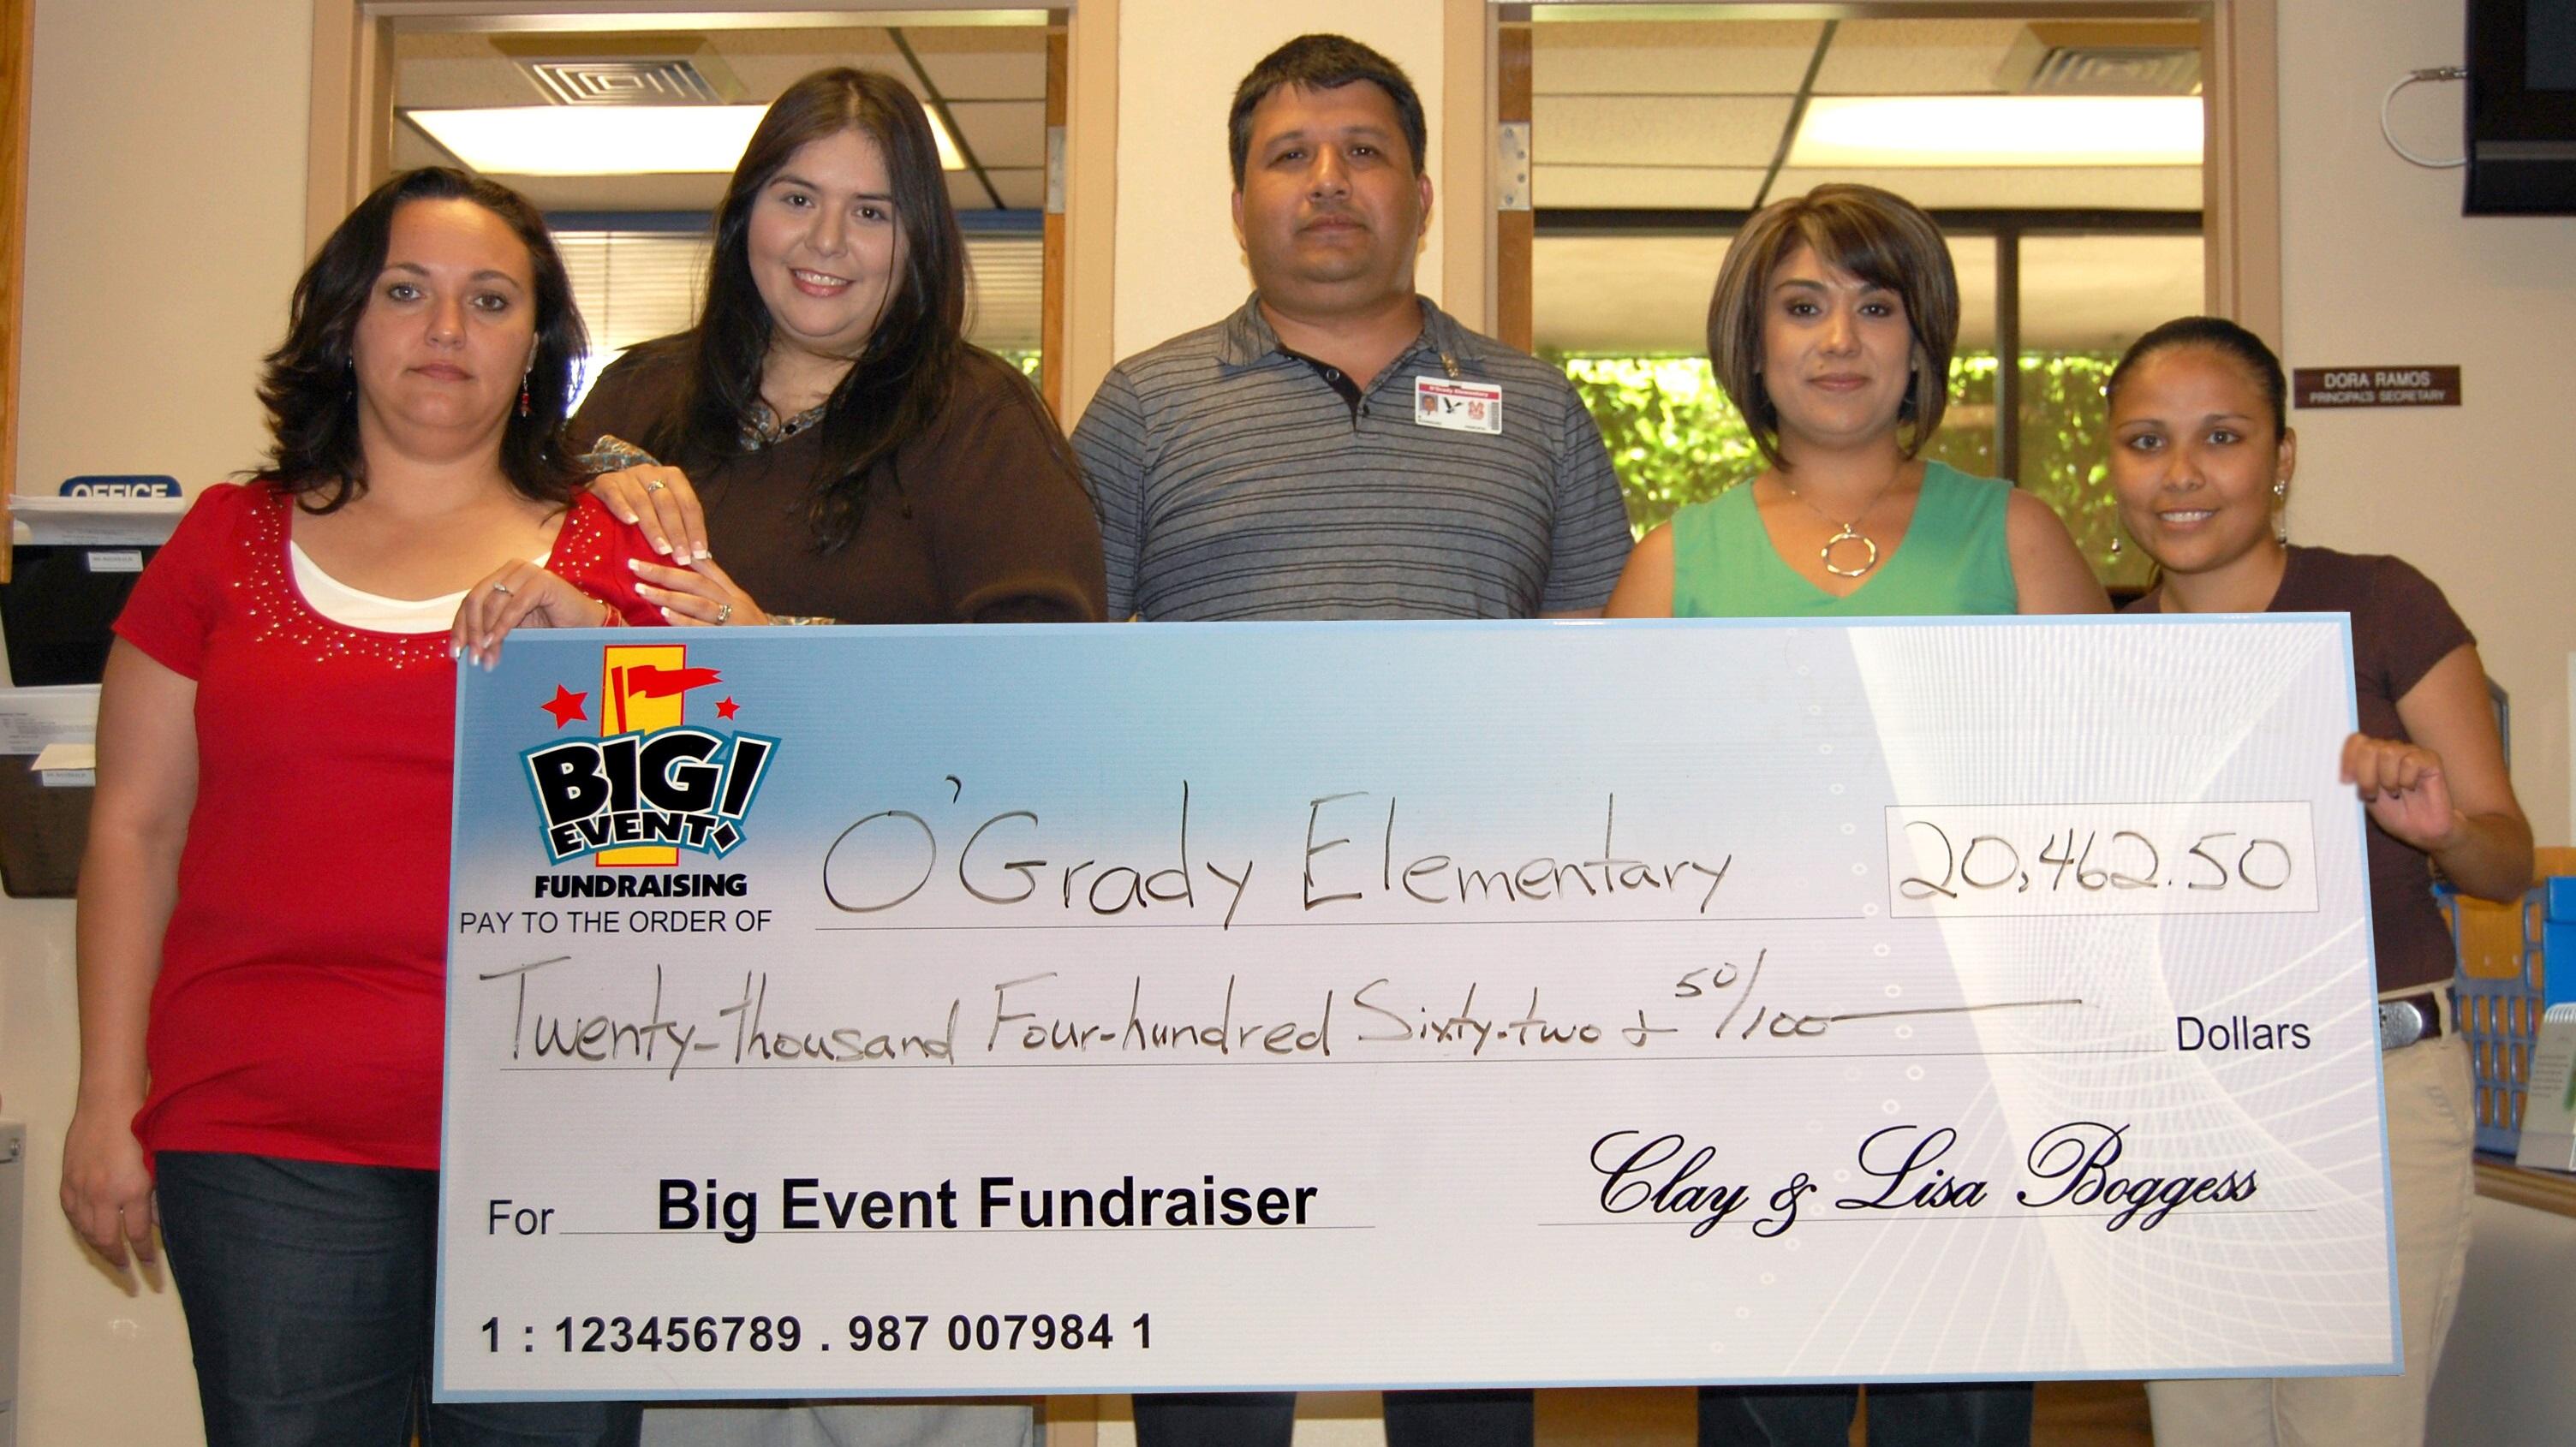 O'Grady Elementary School fundraising team holding check